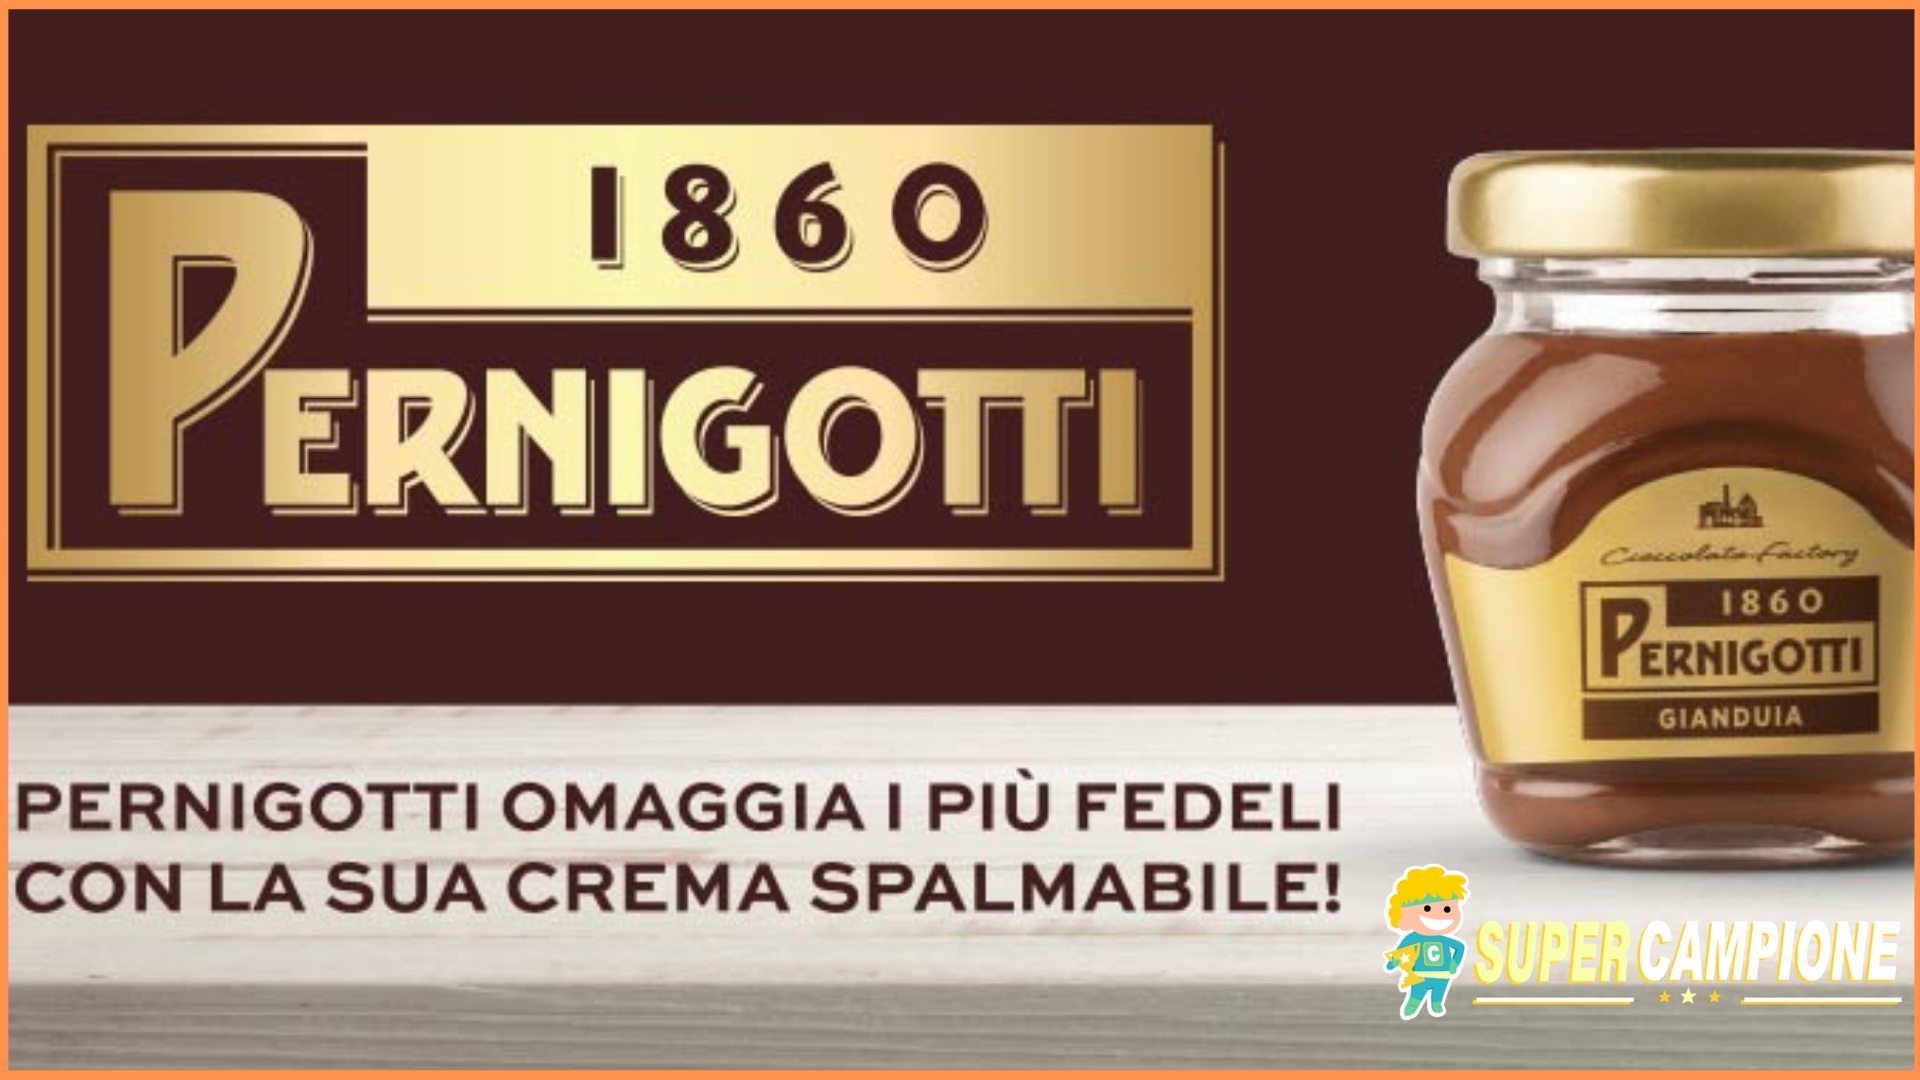 Supercampione - Campioni gratis Pernigotti per l'Eurochocolate 2018